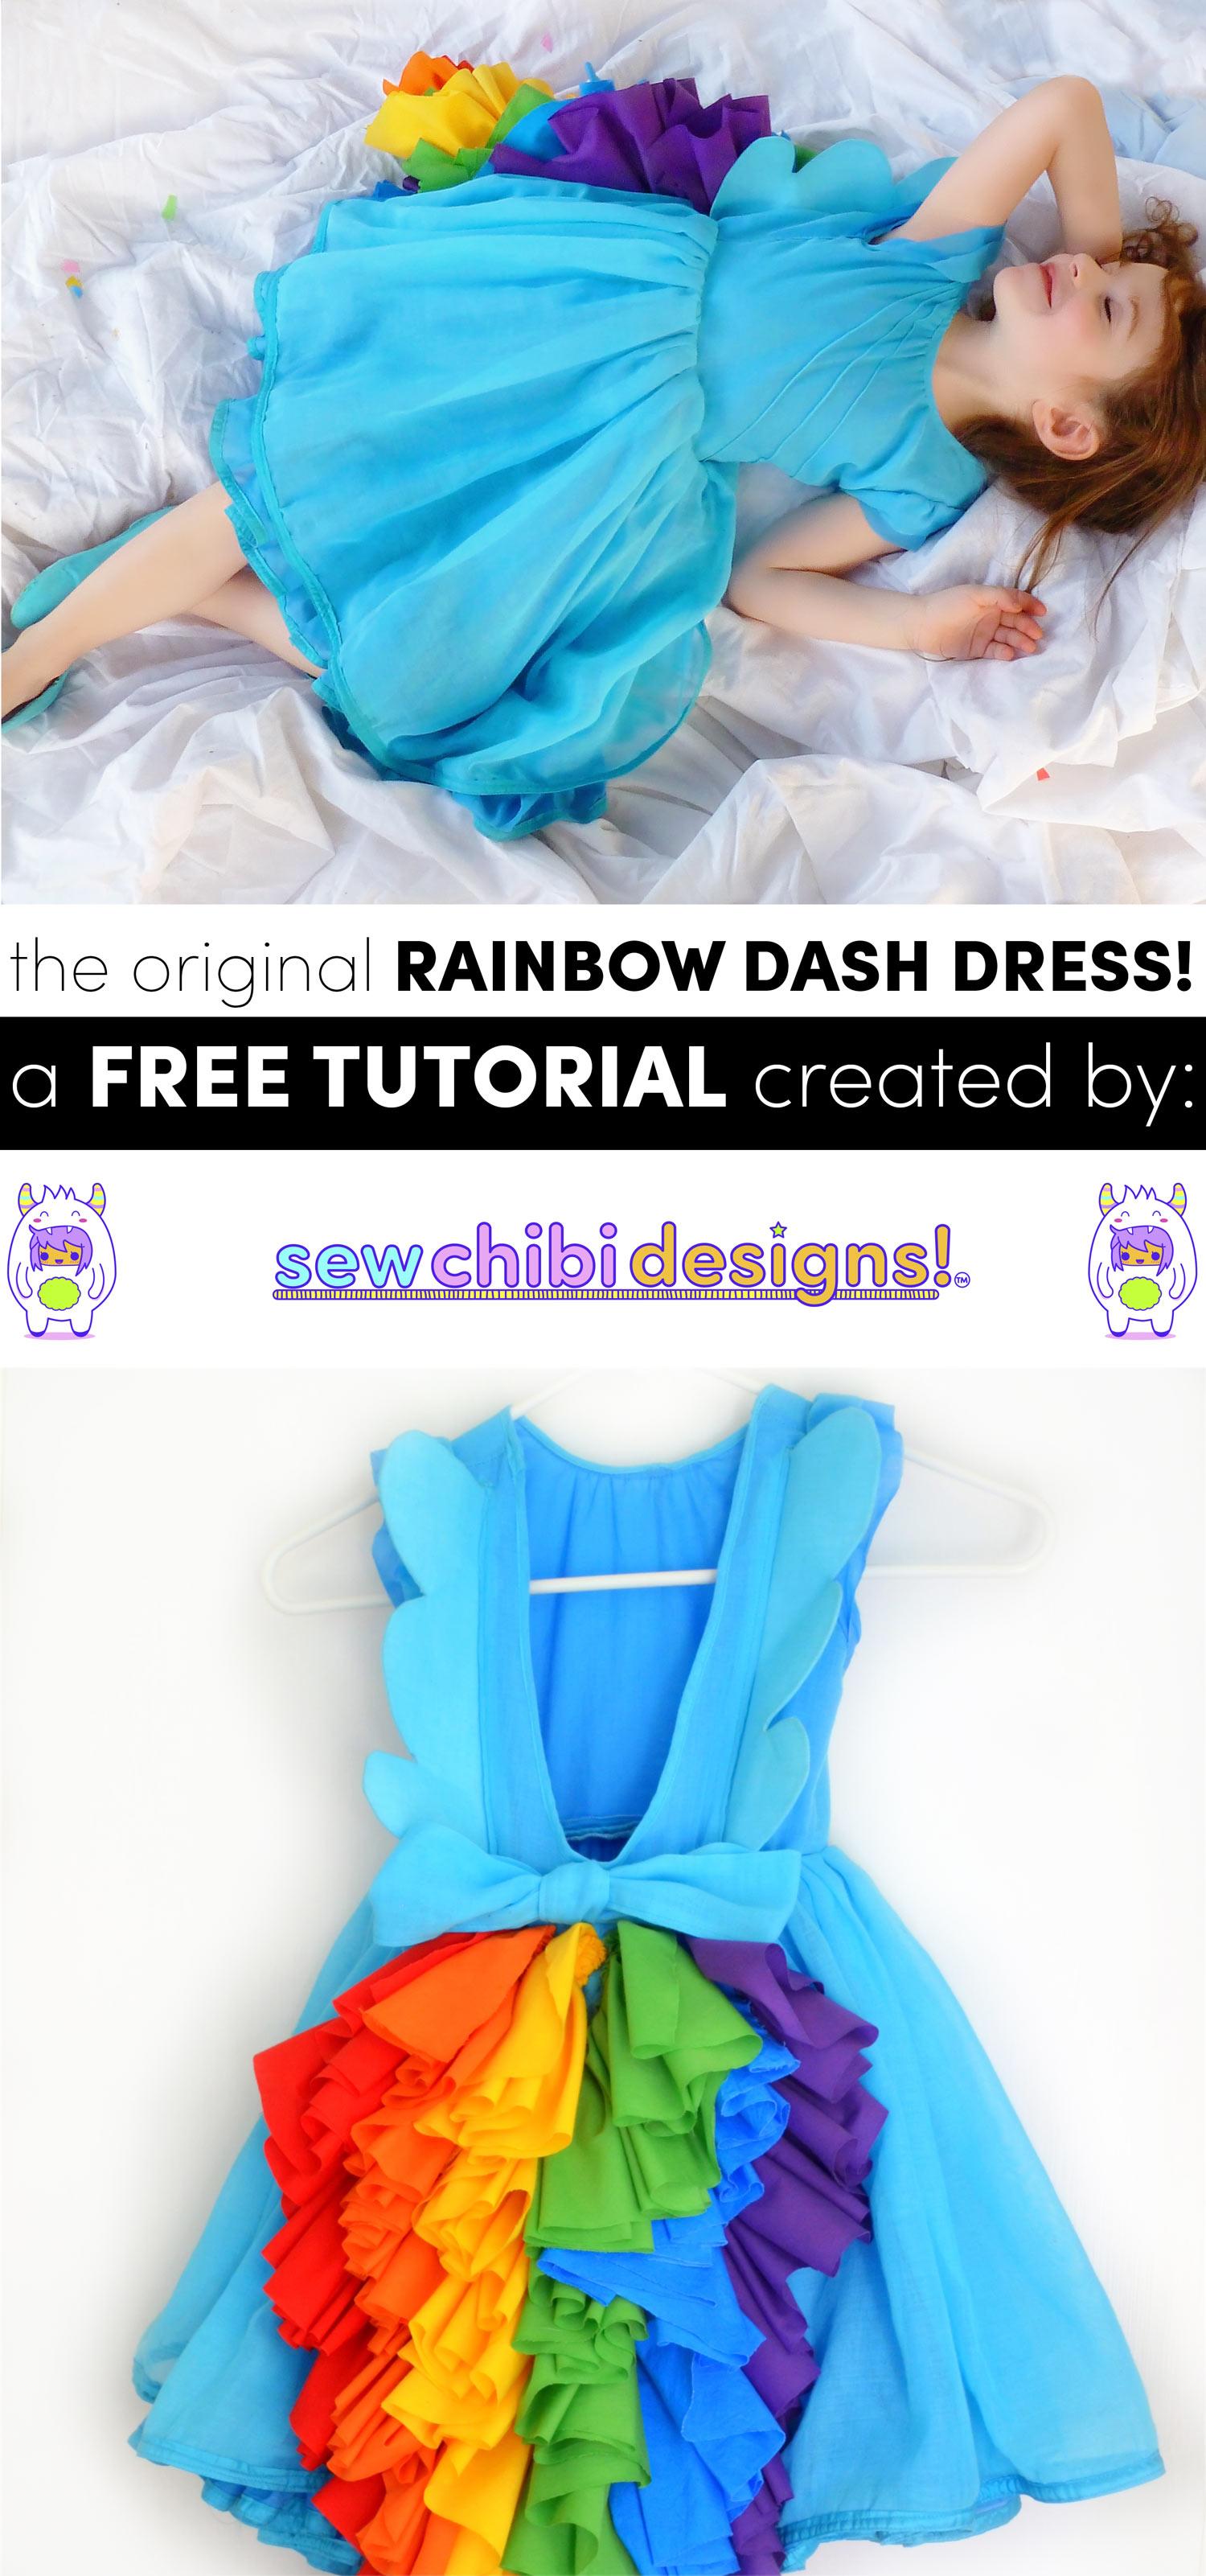 the original rainbow dash dress and free DIY/ Tutorial by sew chibi designs